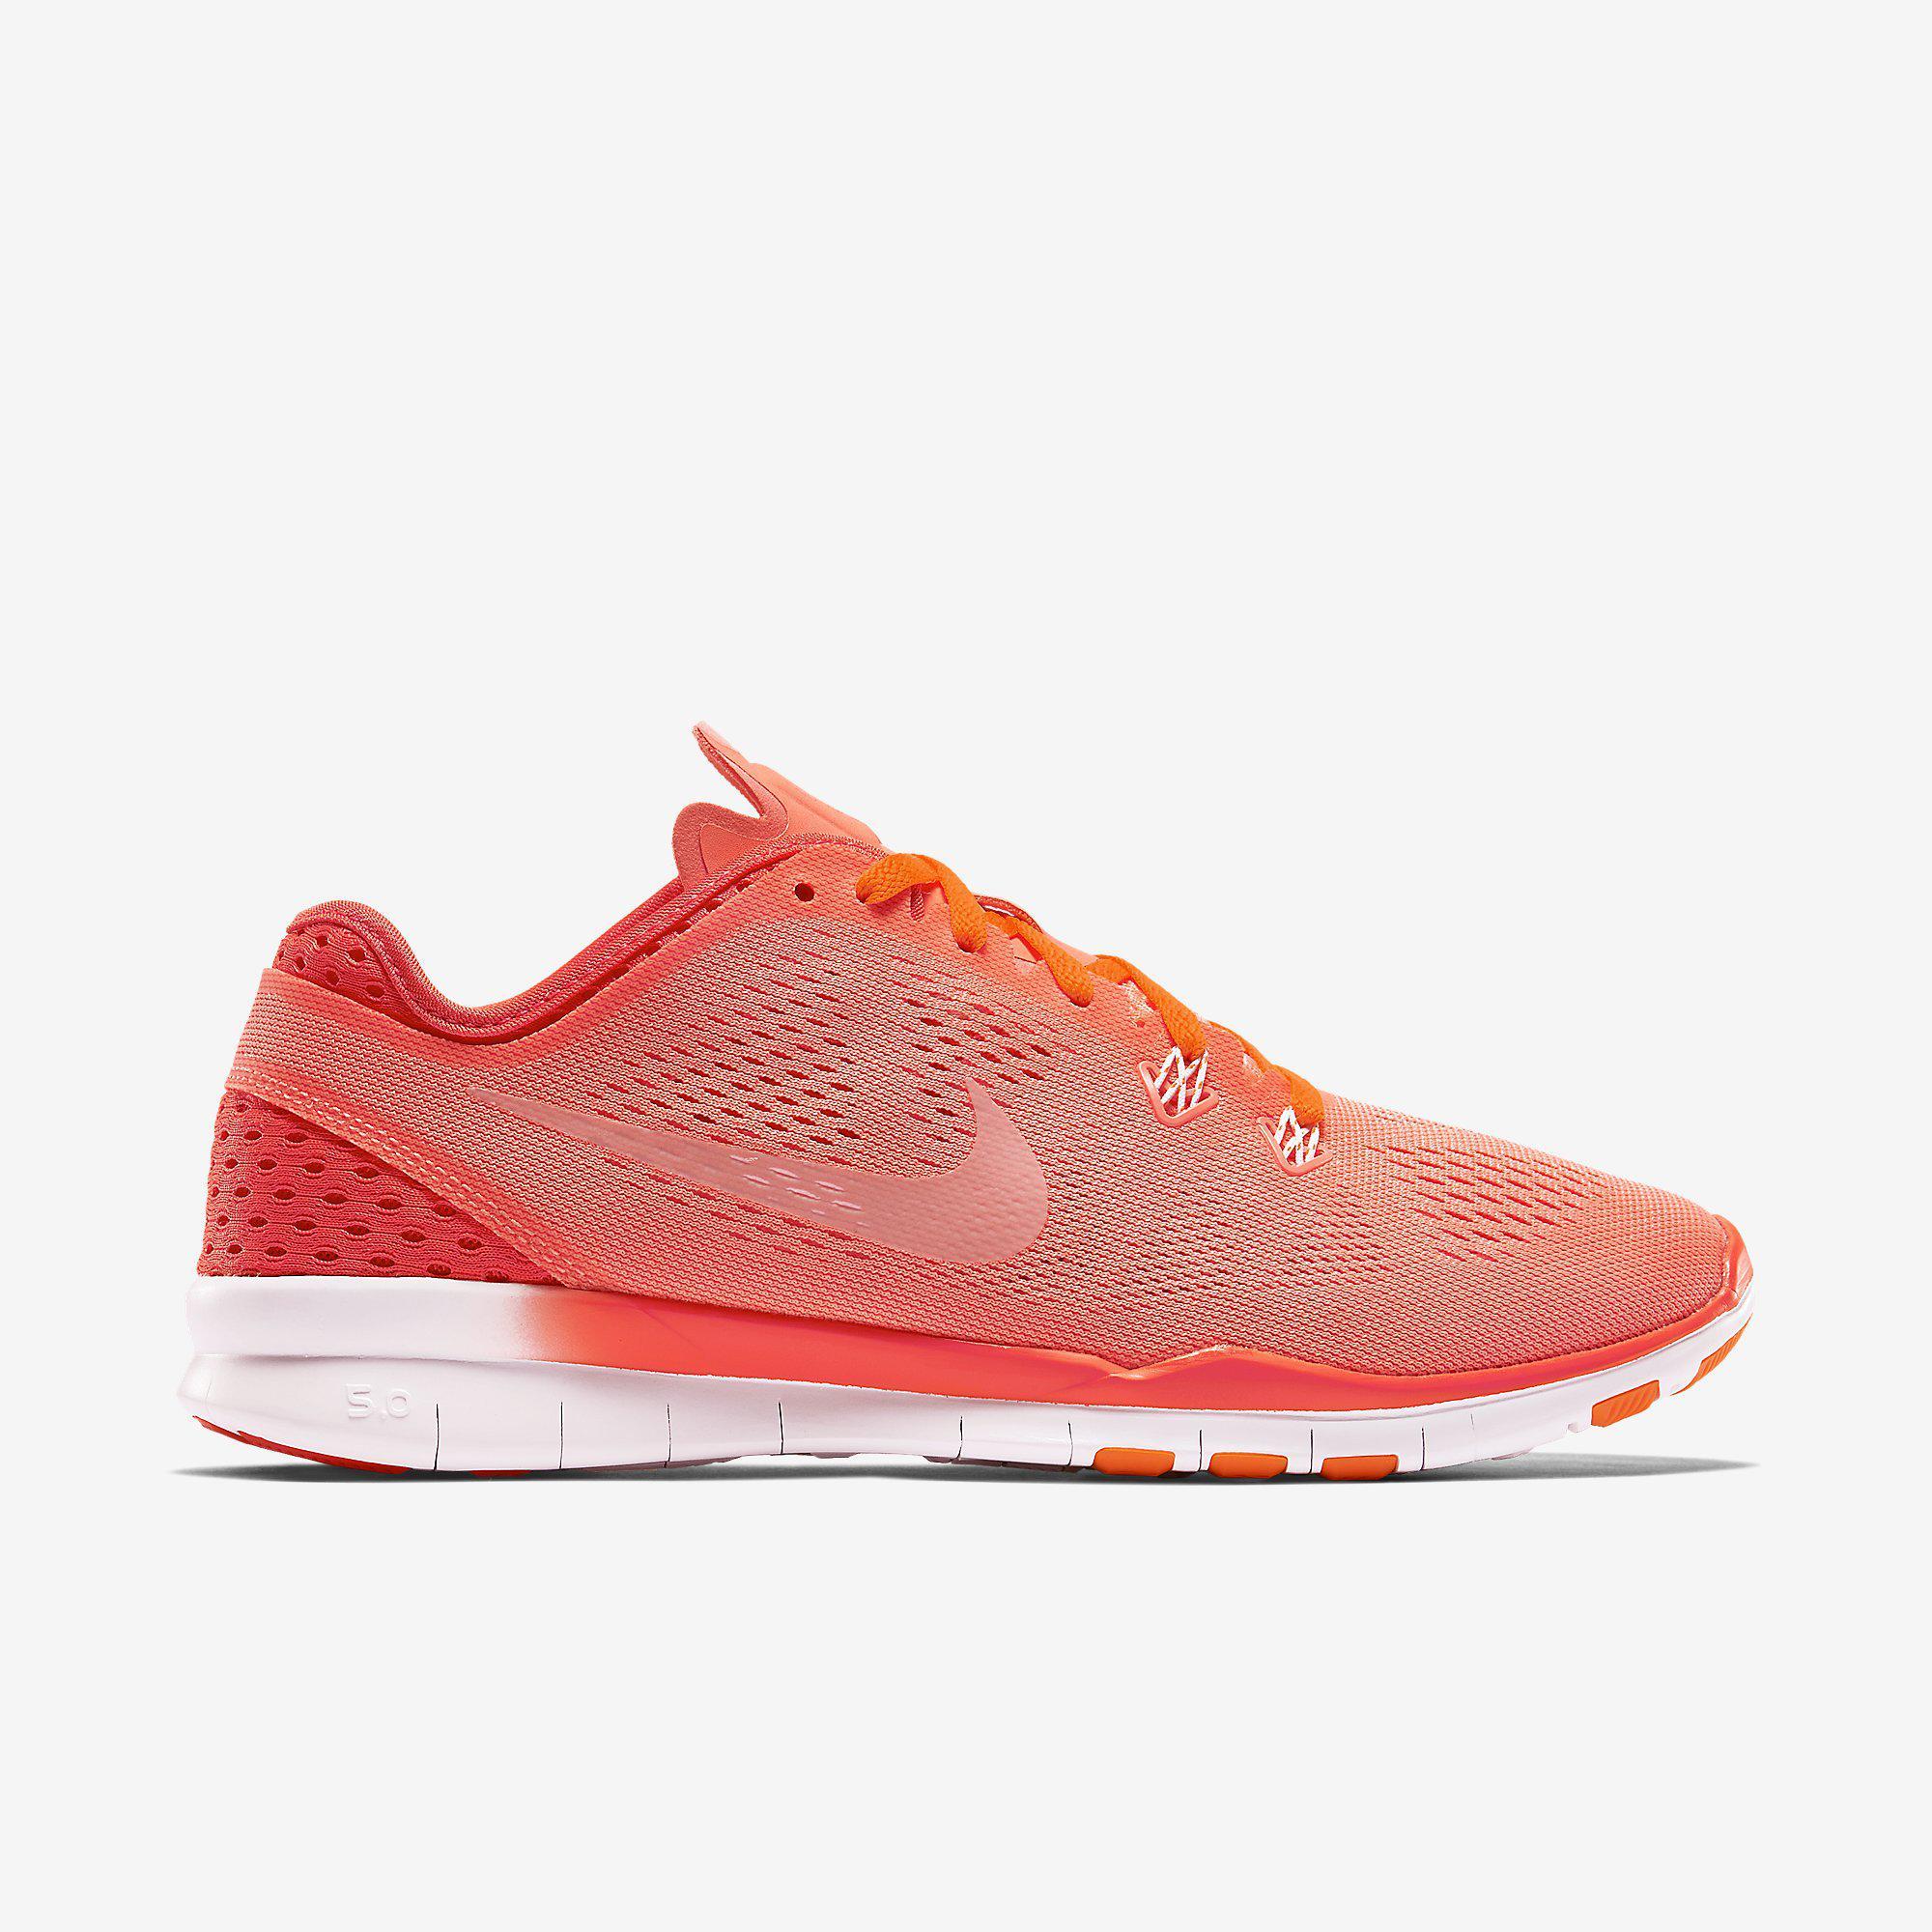 nike free 5.0 breathe Nike Womens Free 5.0 TR Breathe Training Shoes - Lava Glow/Bright ...